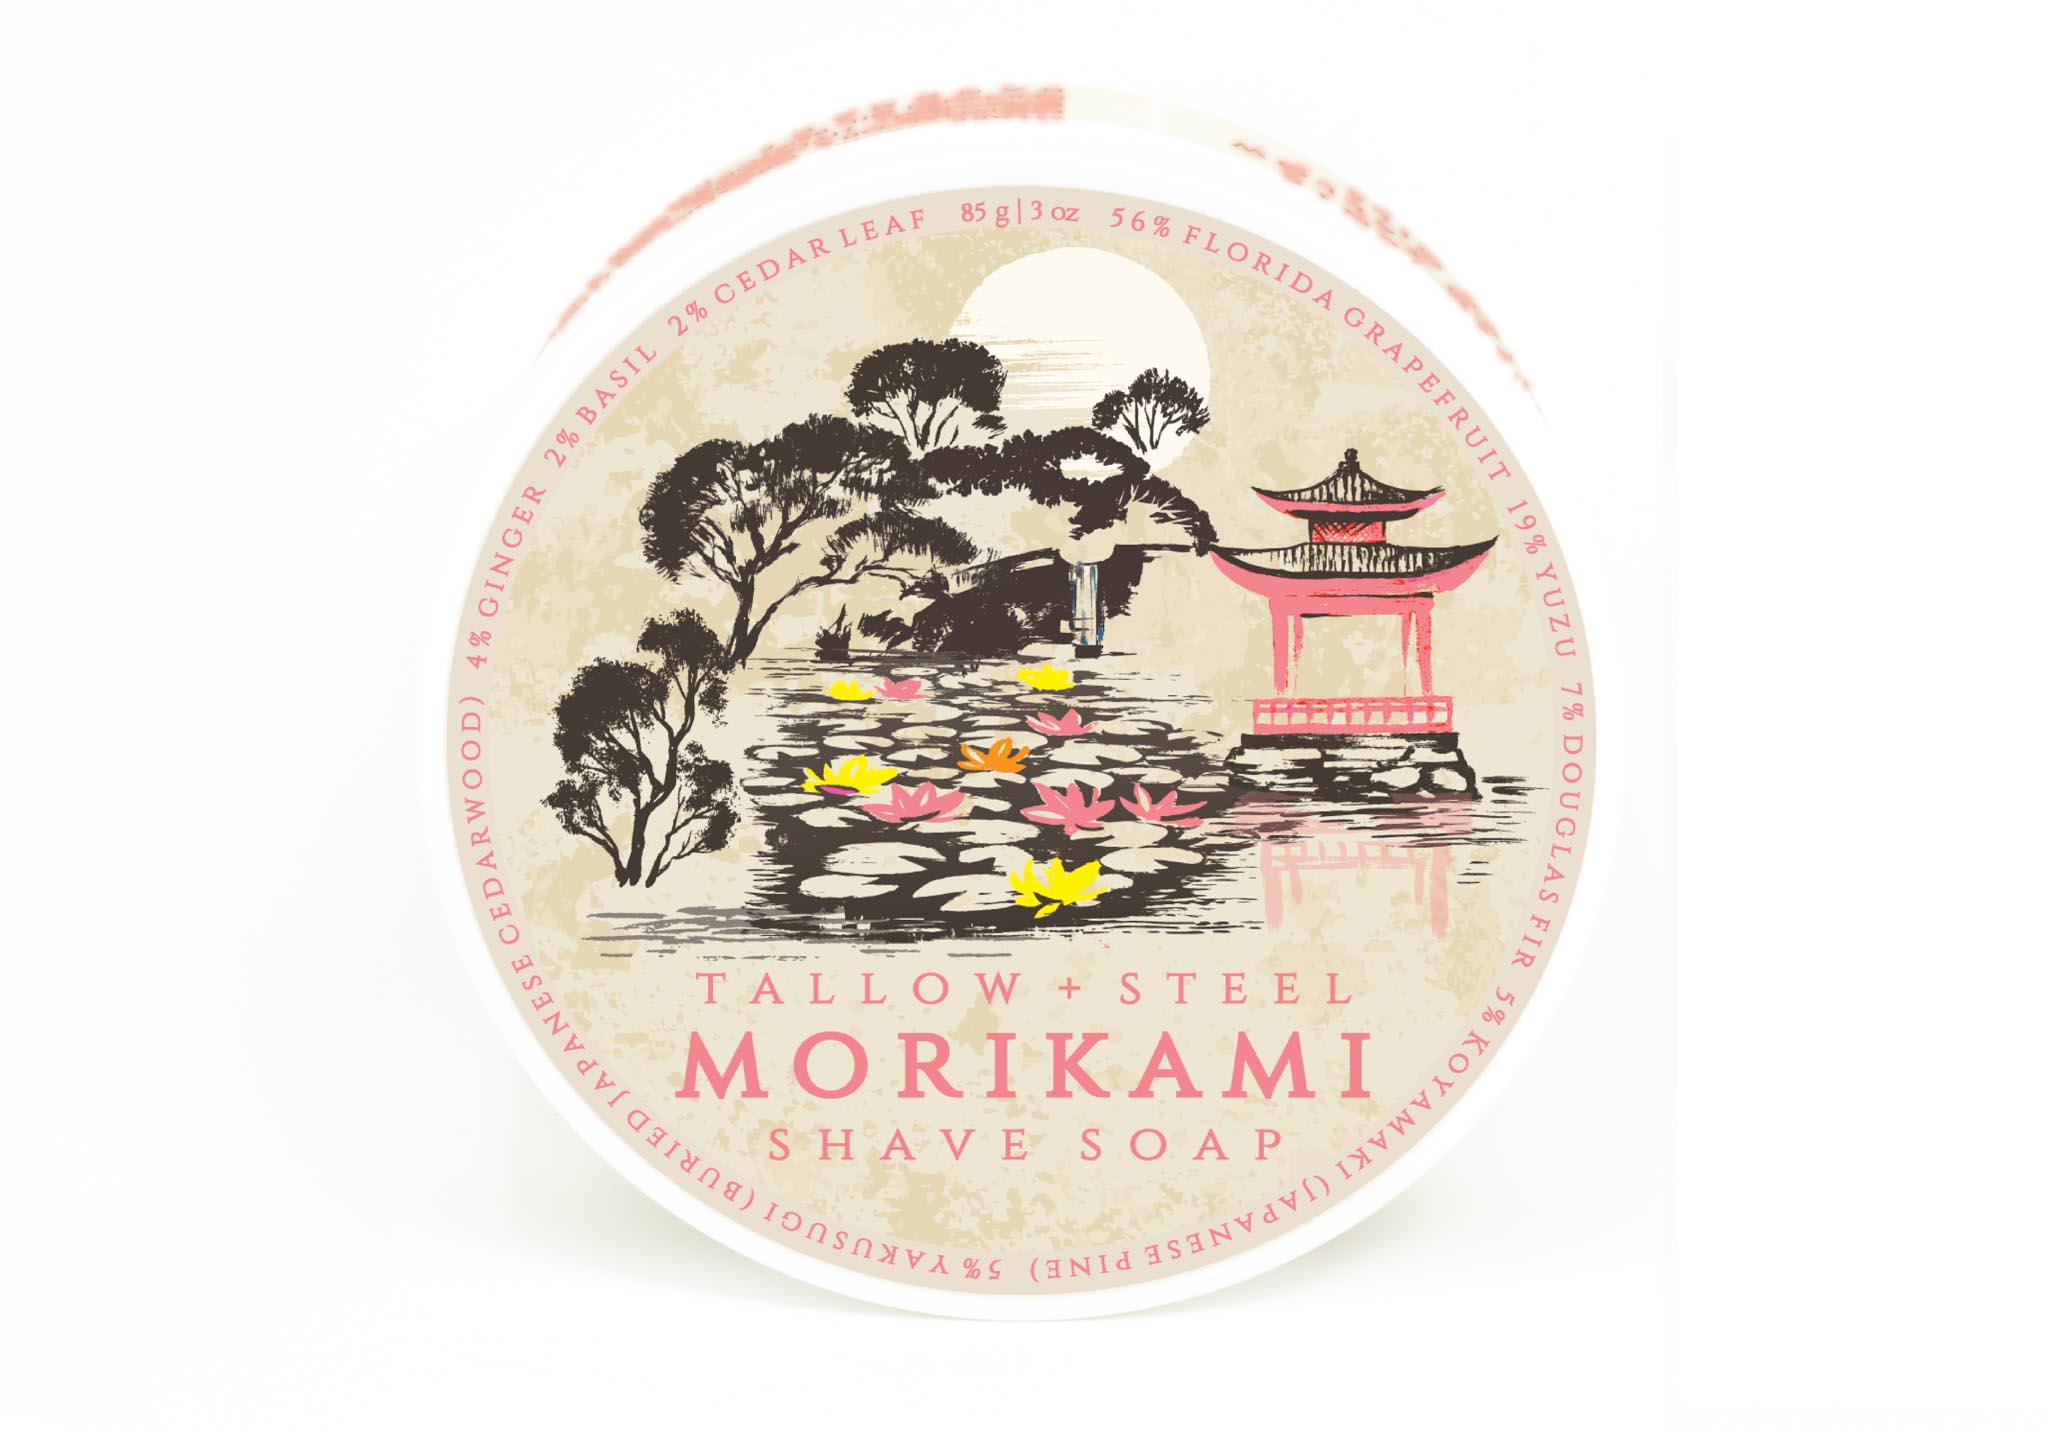 Tallow + Steel - Morikami - Soap image